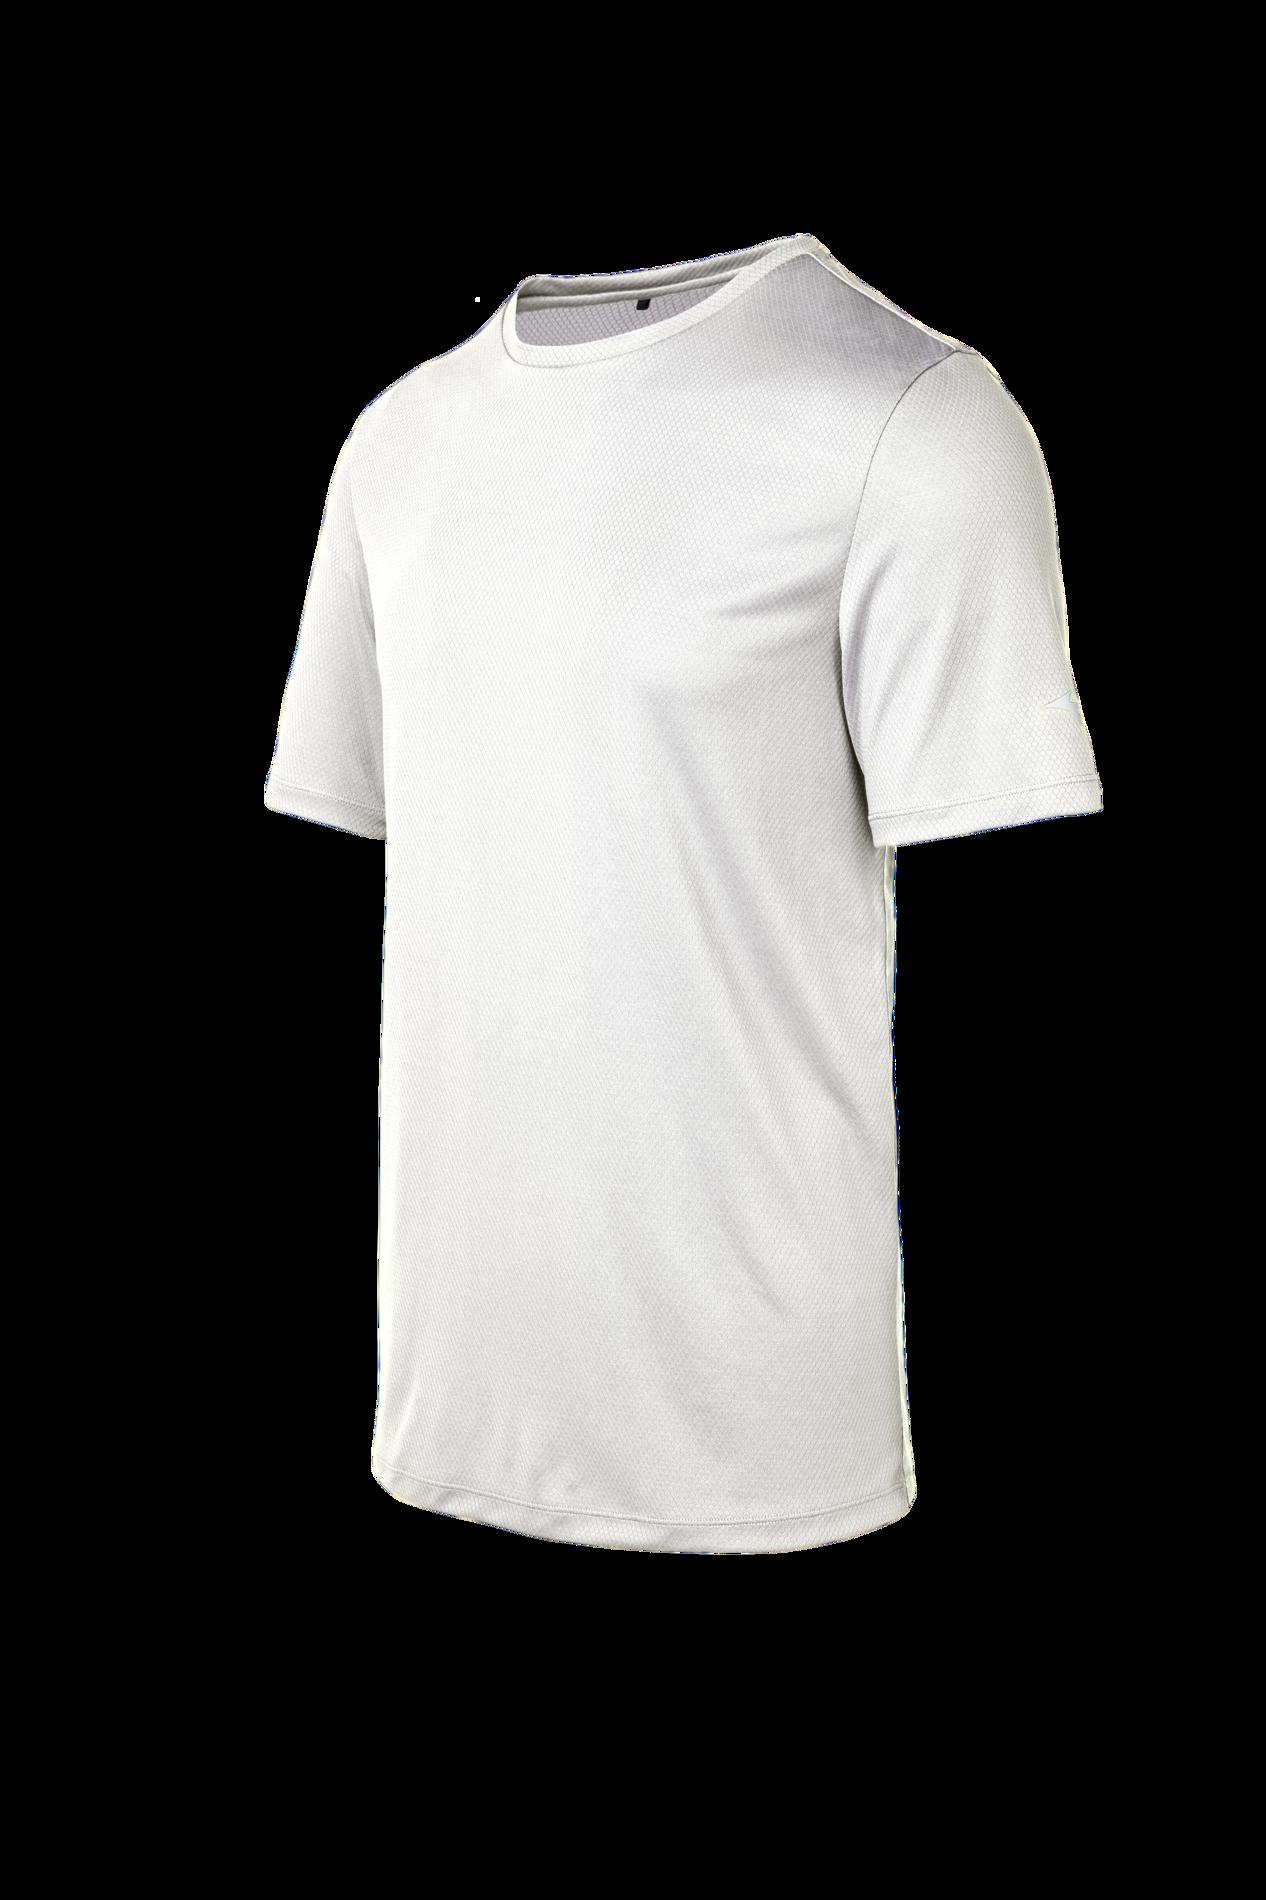 NEW Mizuno Men's Athletic Workout Inspire Short Sleeve Crew Neck Running T-Shirt